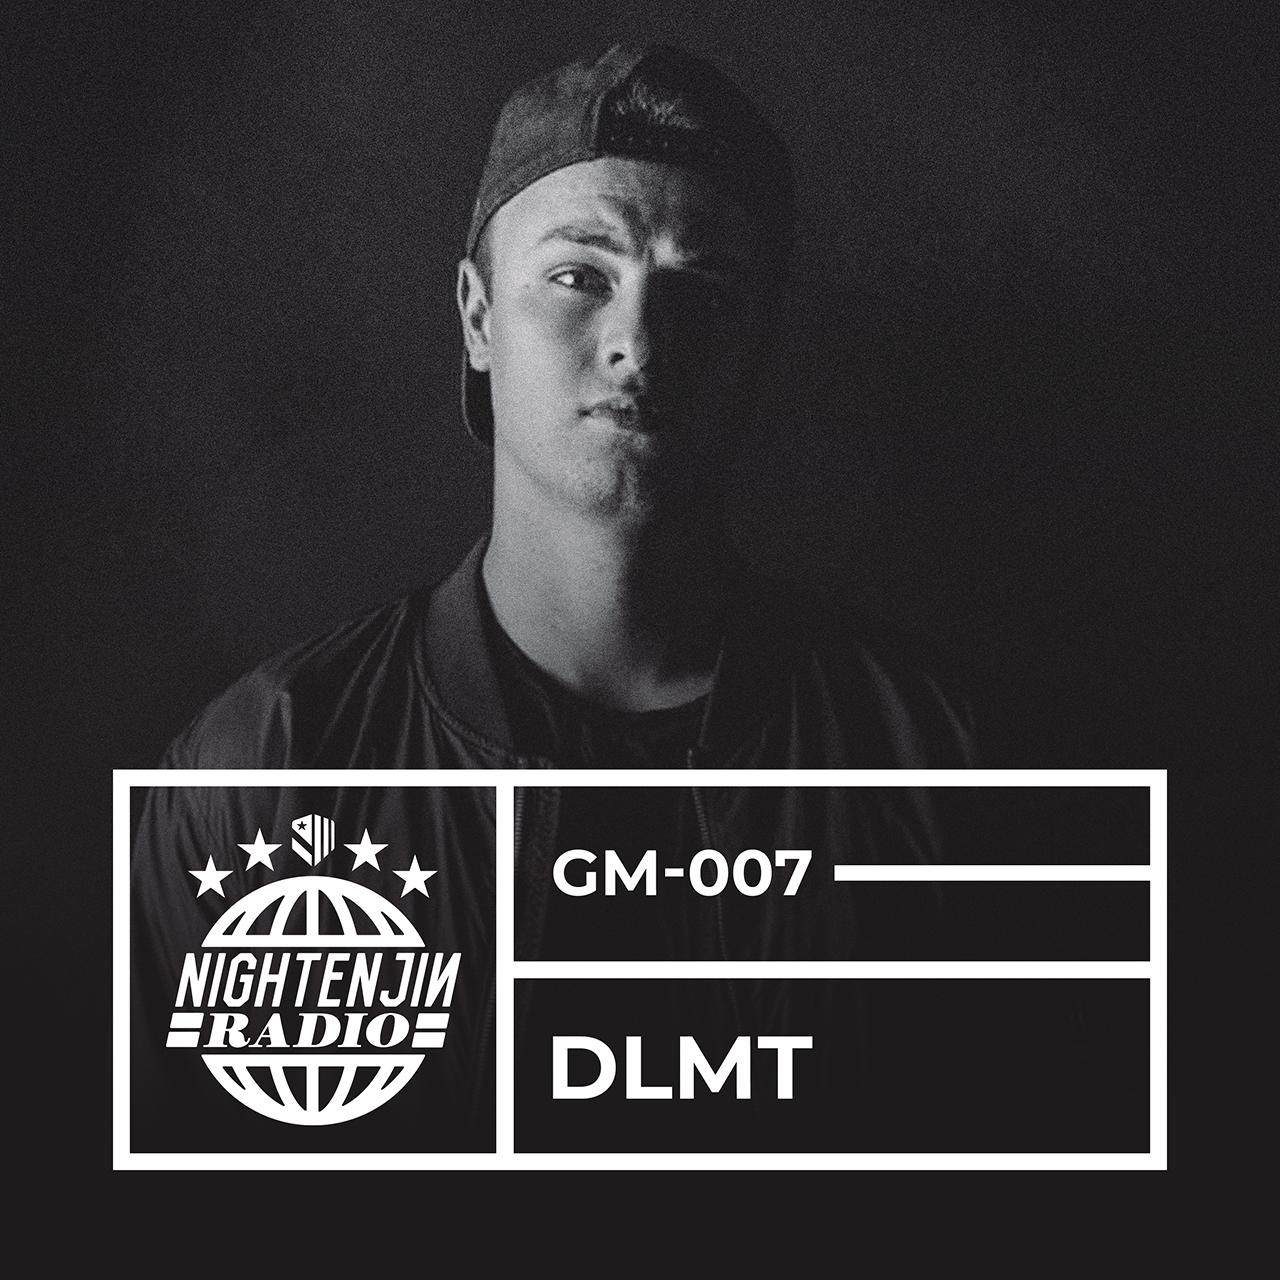 Nightenjin Radio GM-007: DLMT